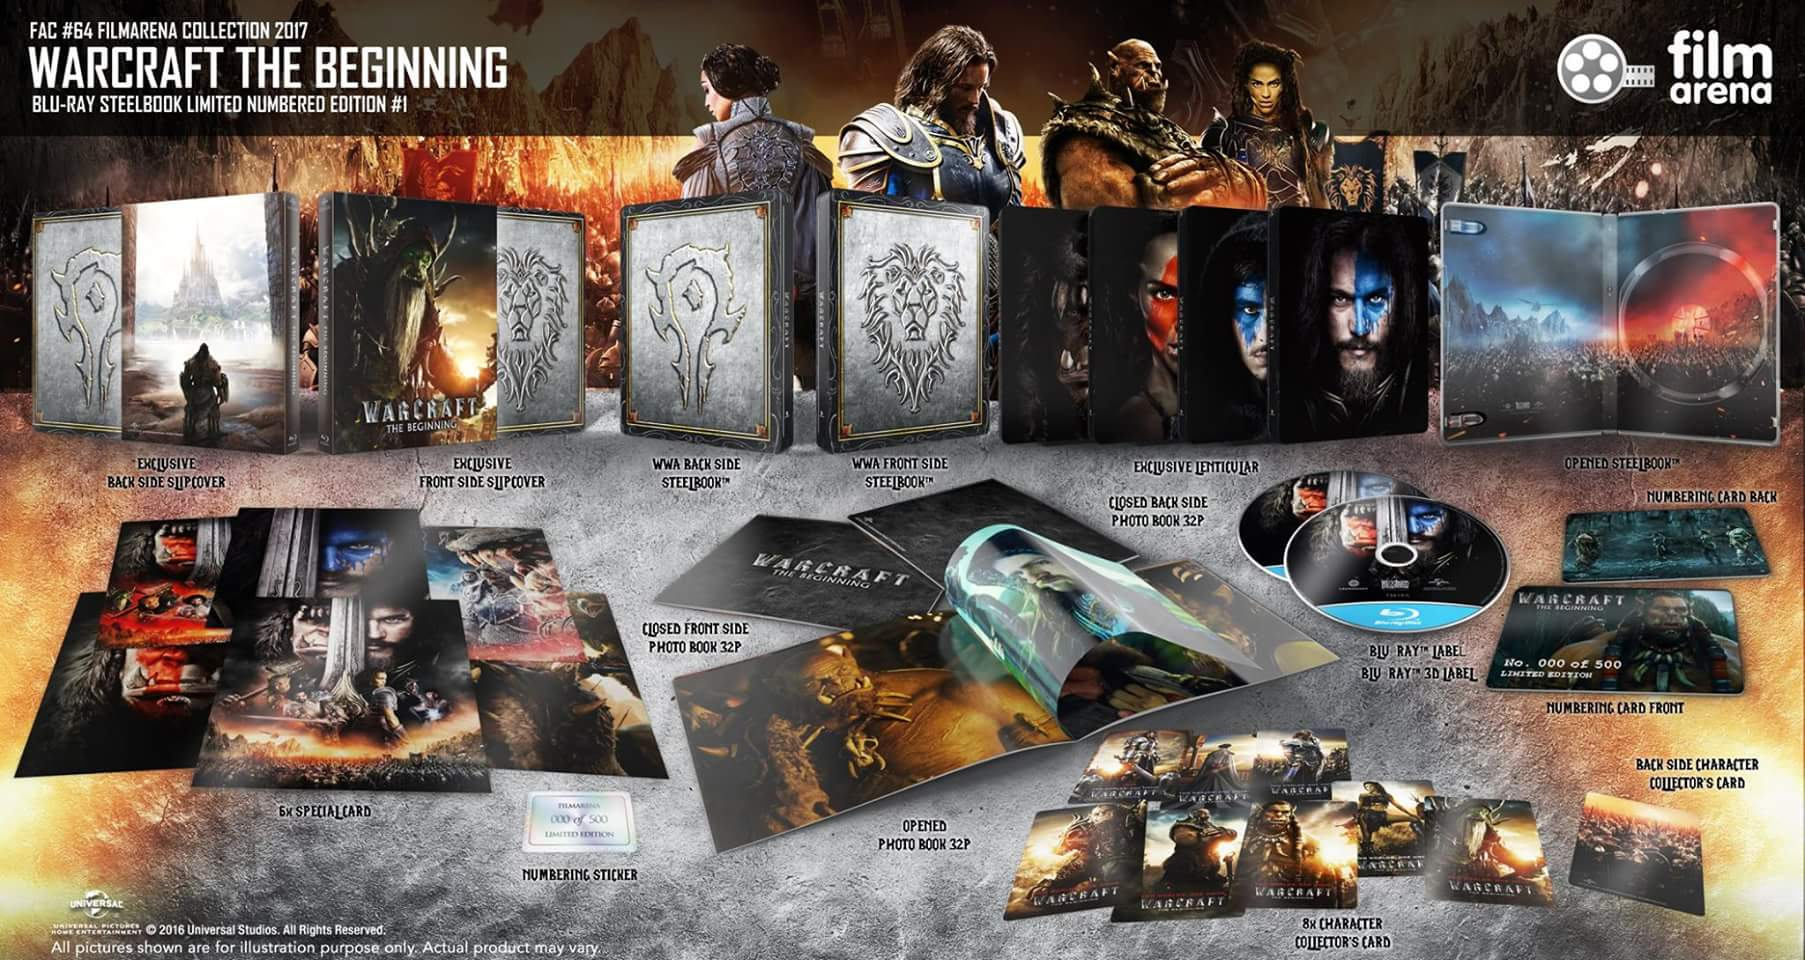 Warcraft steelbook filmarena 1